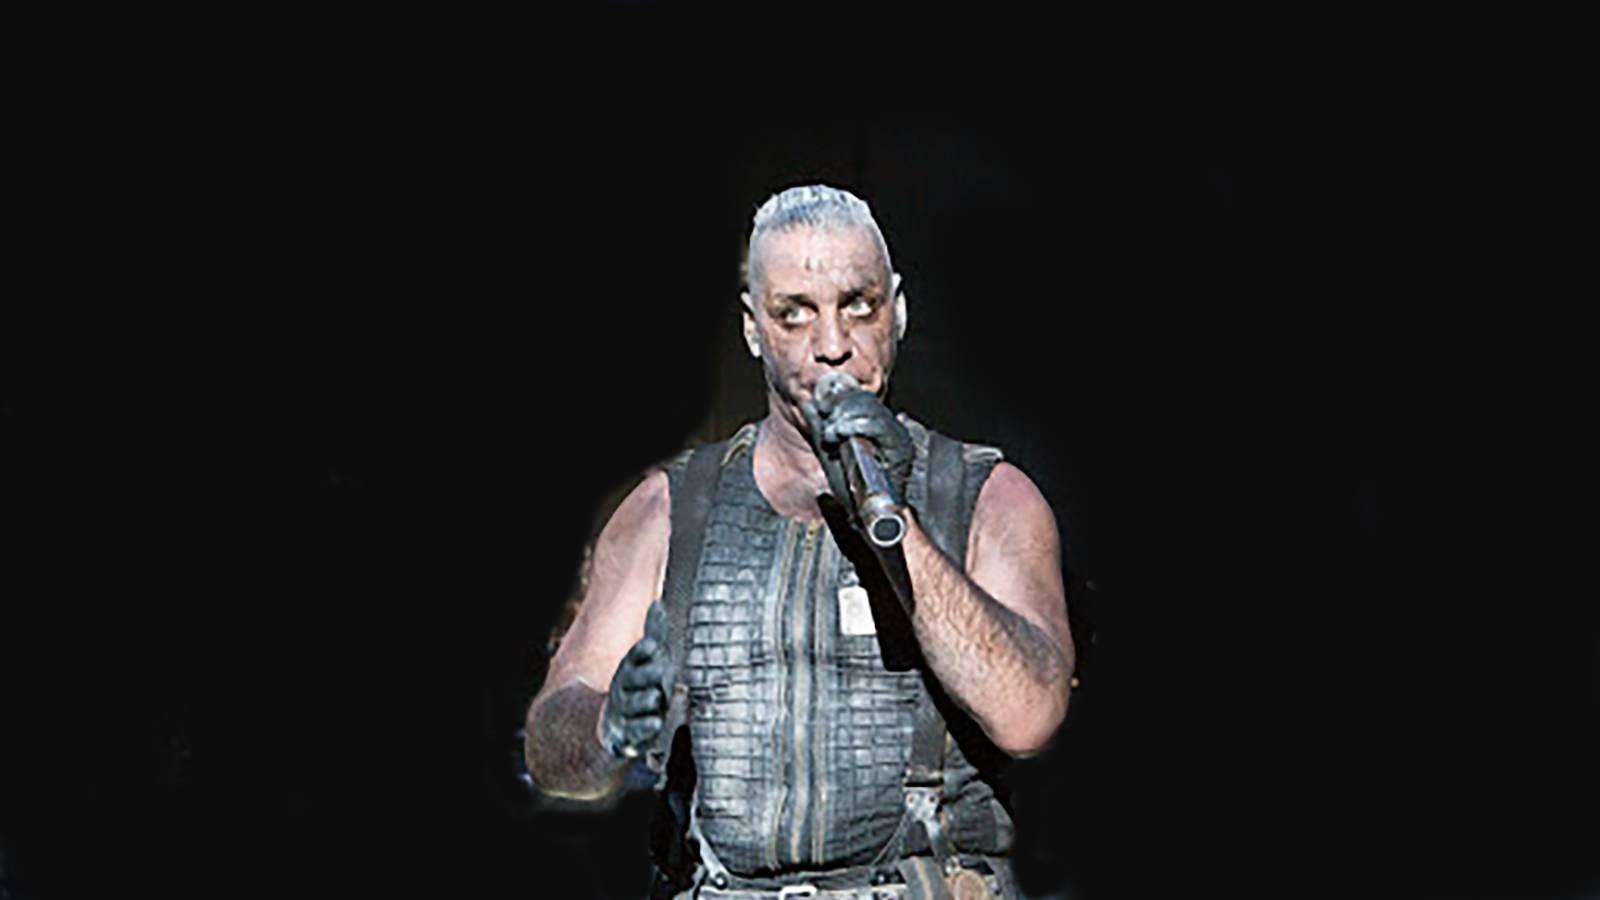 Rammstein (Rescheduled from 9/3/2020)